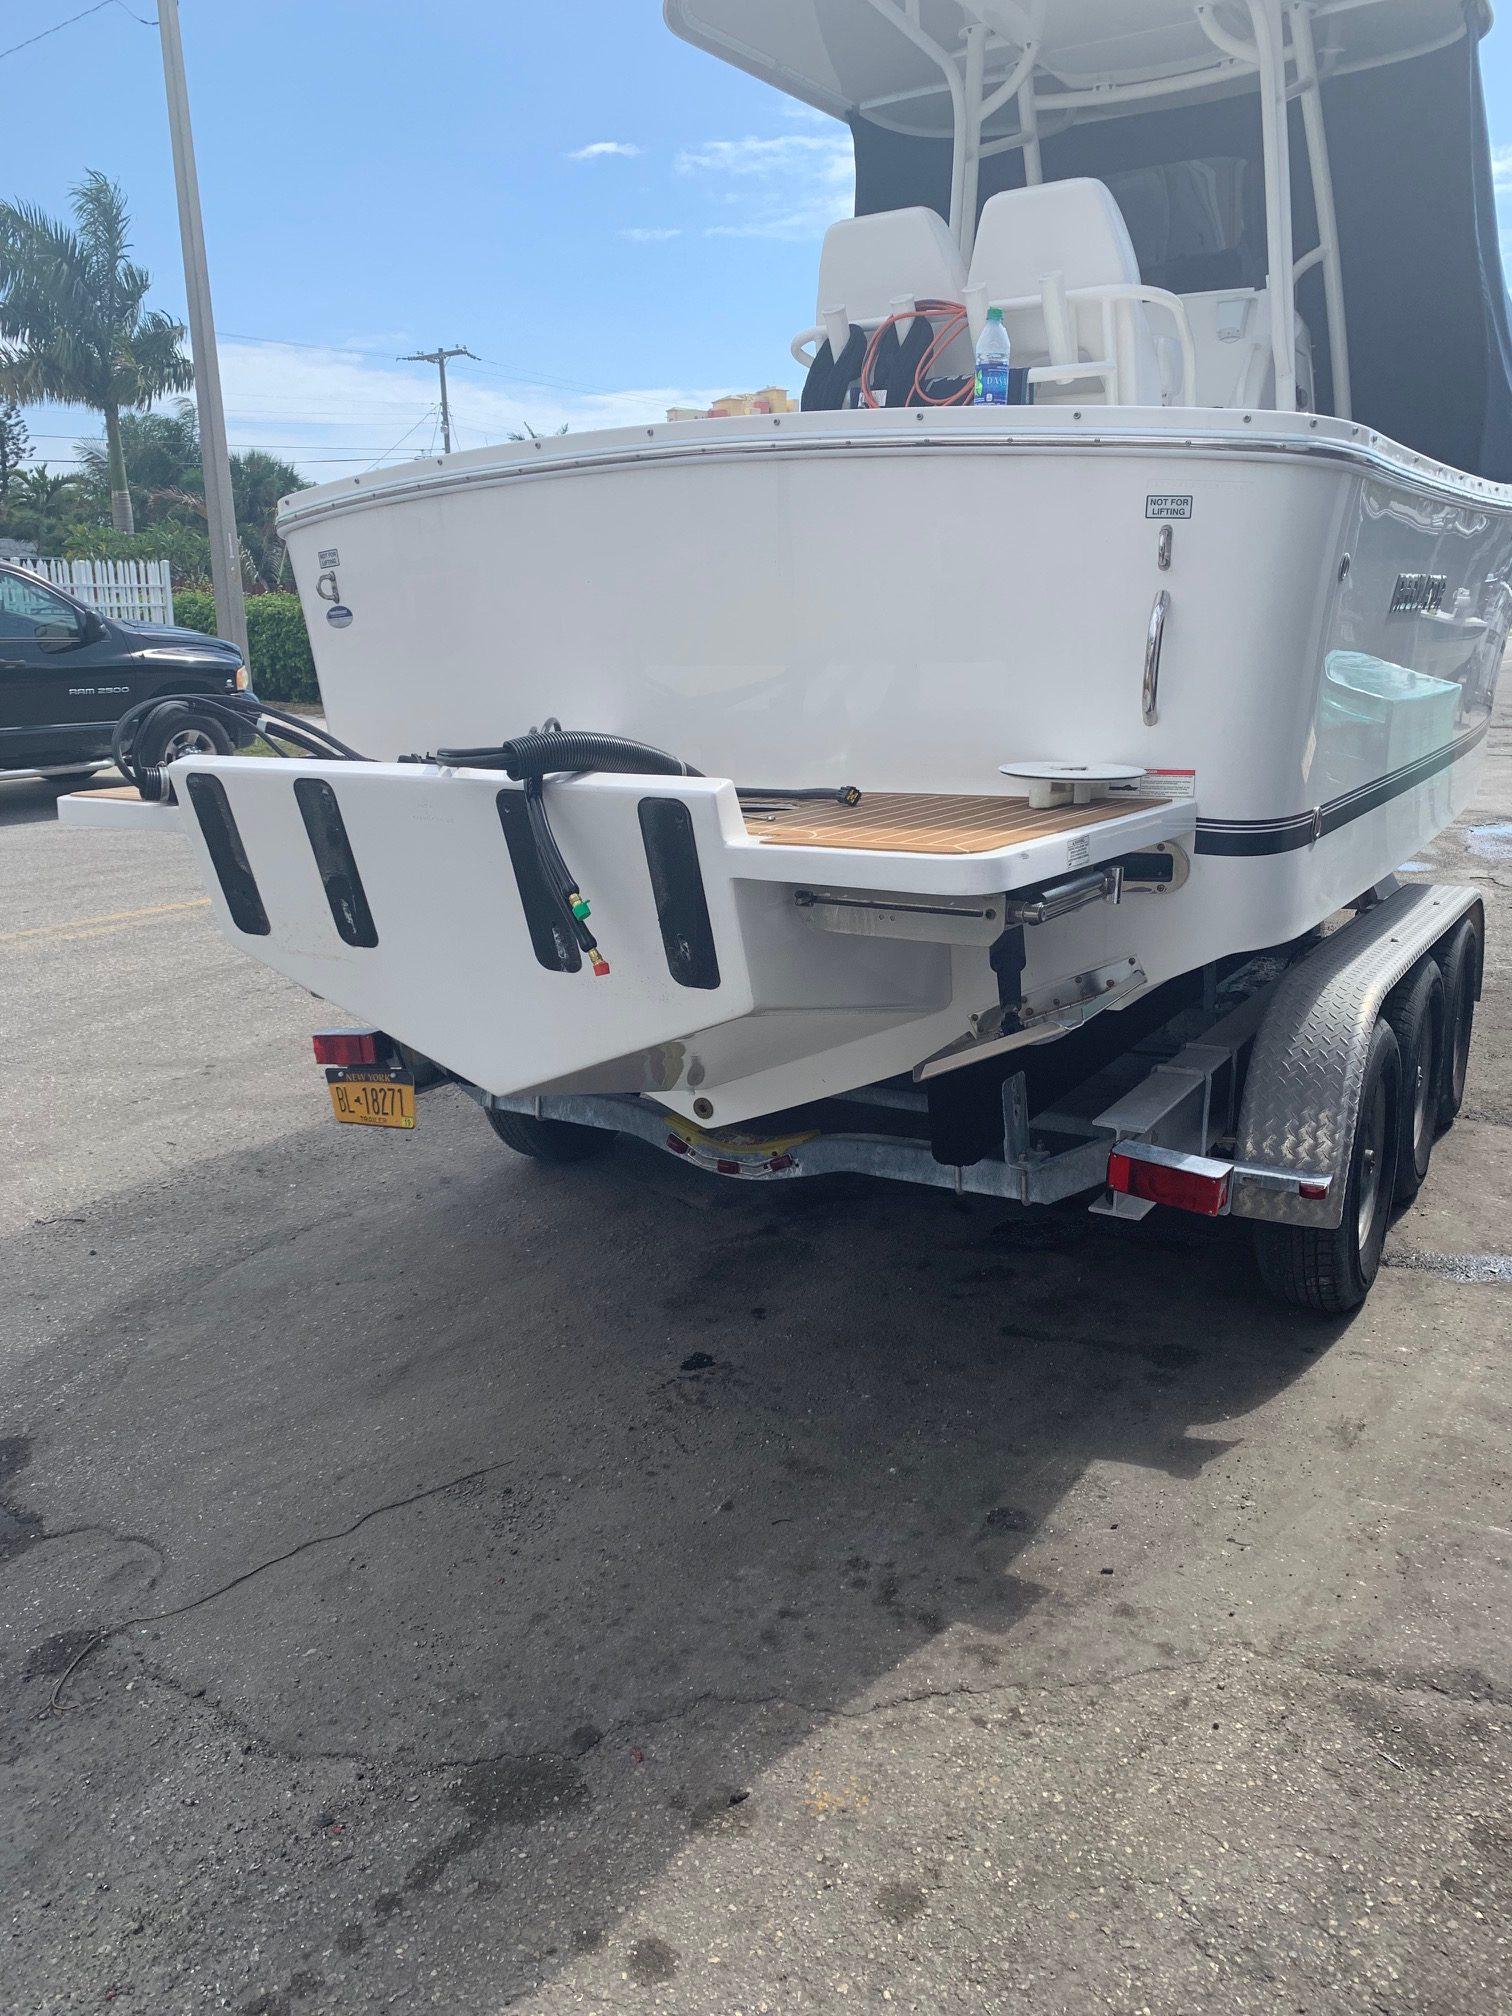 regulator boats